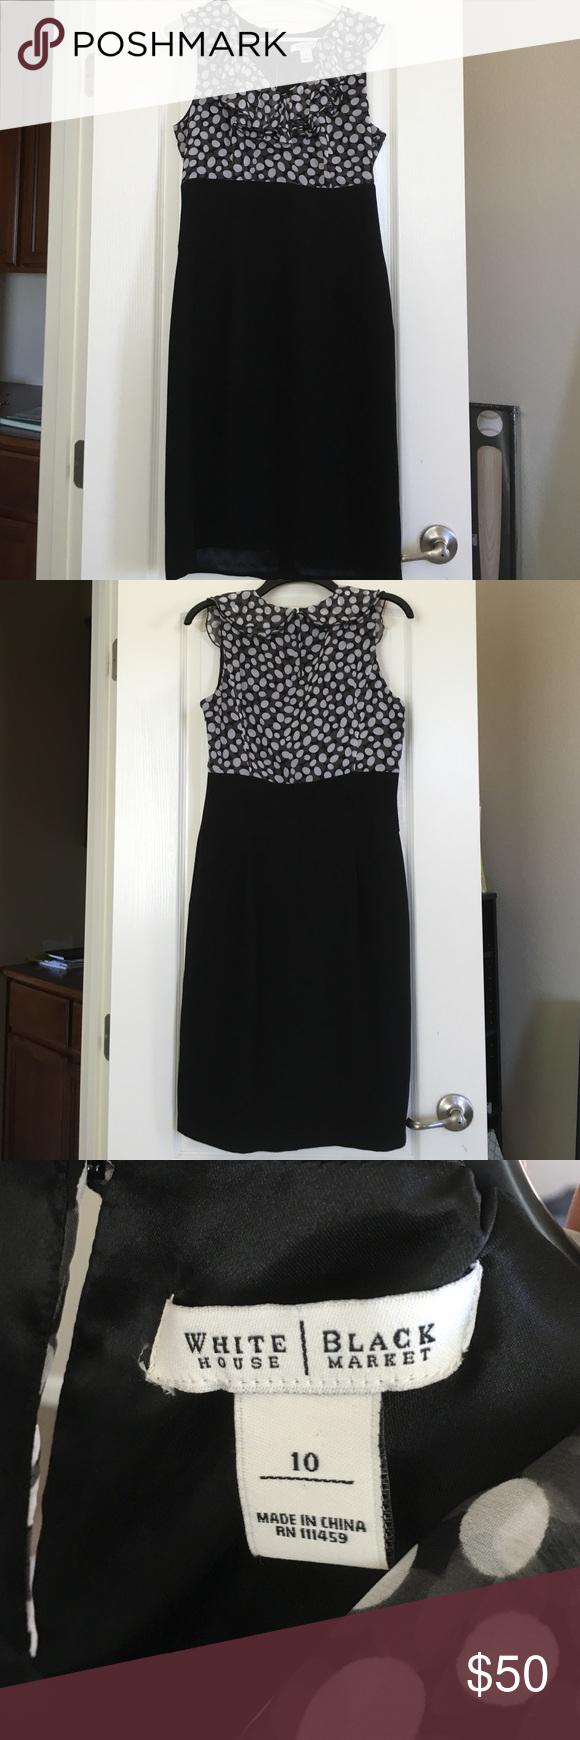 White House Black Market Dress Black and white fitted dress. Knee length, pencil skirt type bottom with a fitted top with ruffles. White House Black Market Dresses Midi